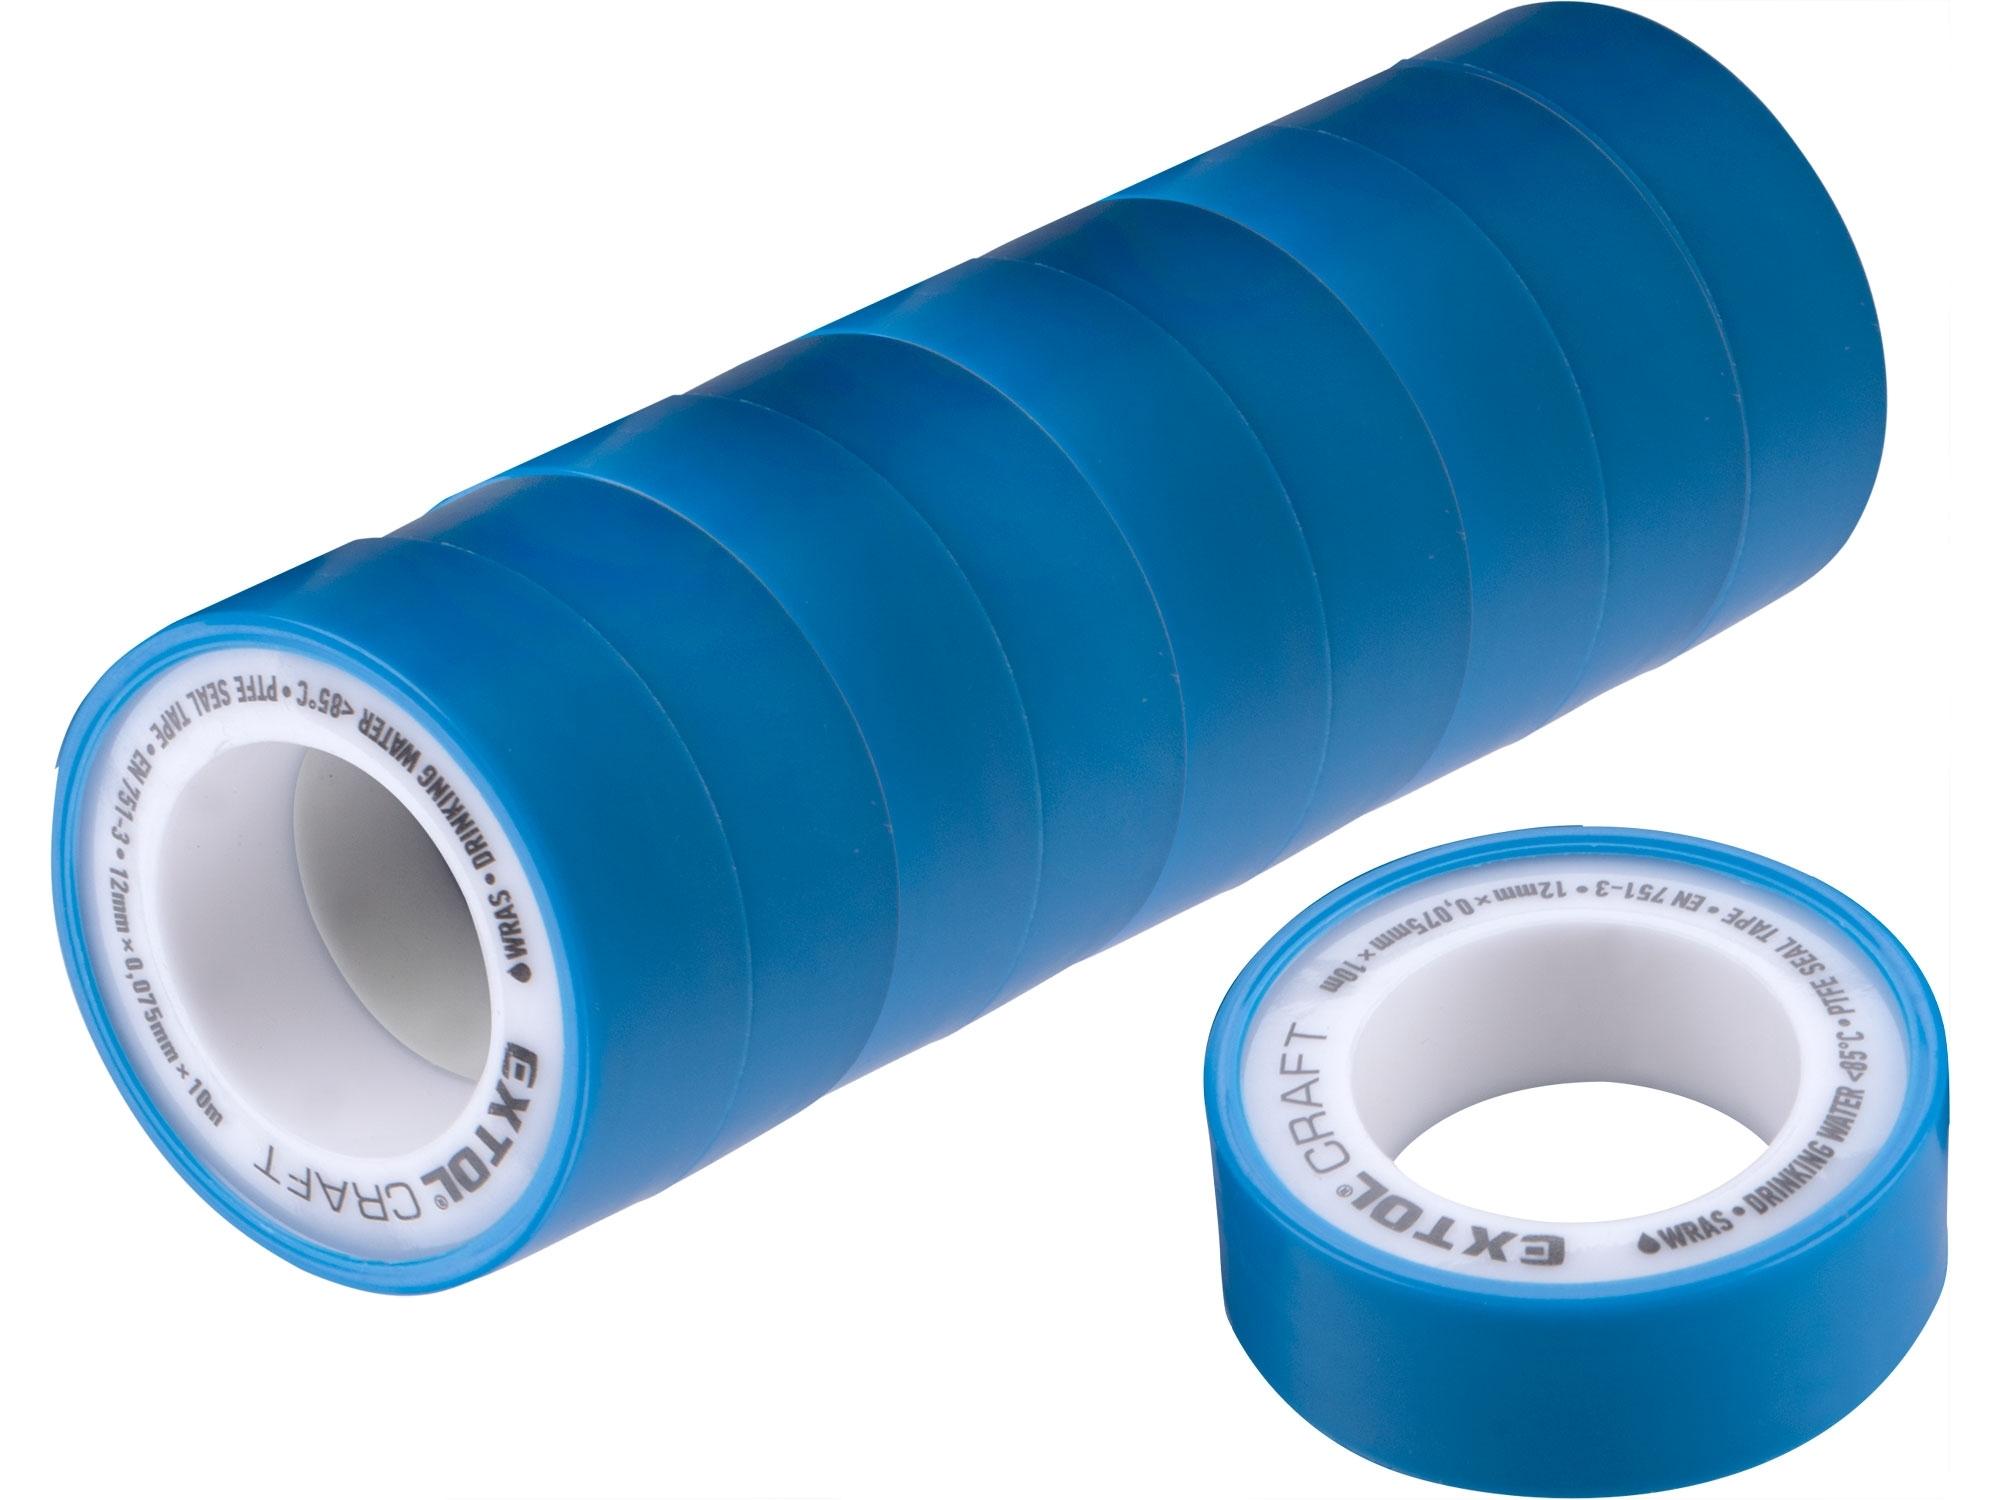 pásky těsnící teflonové, sada 10ks, 12mm x 10m, EXTOL CRAFT 47531